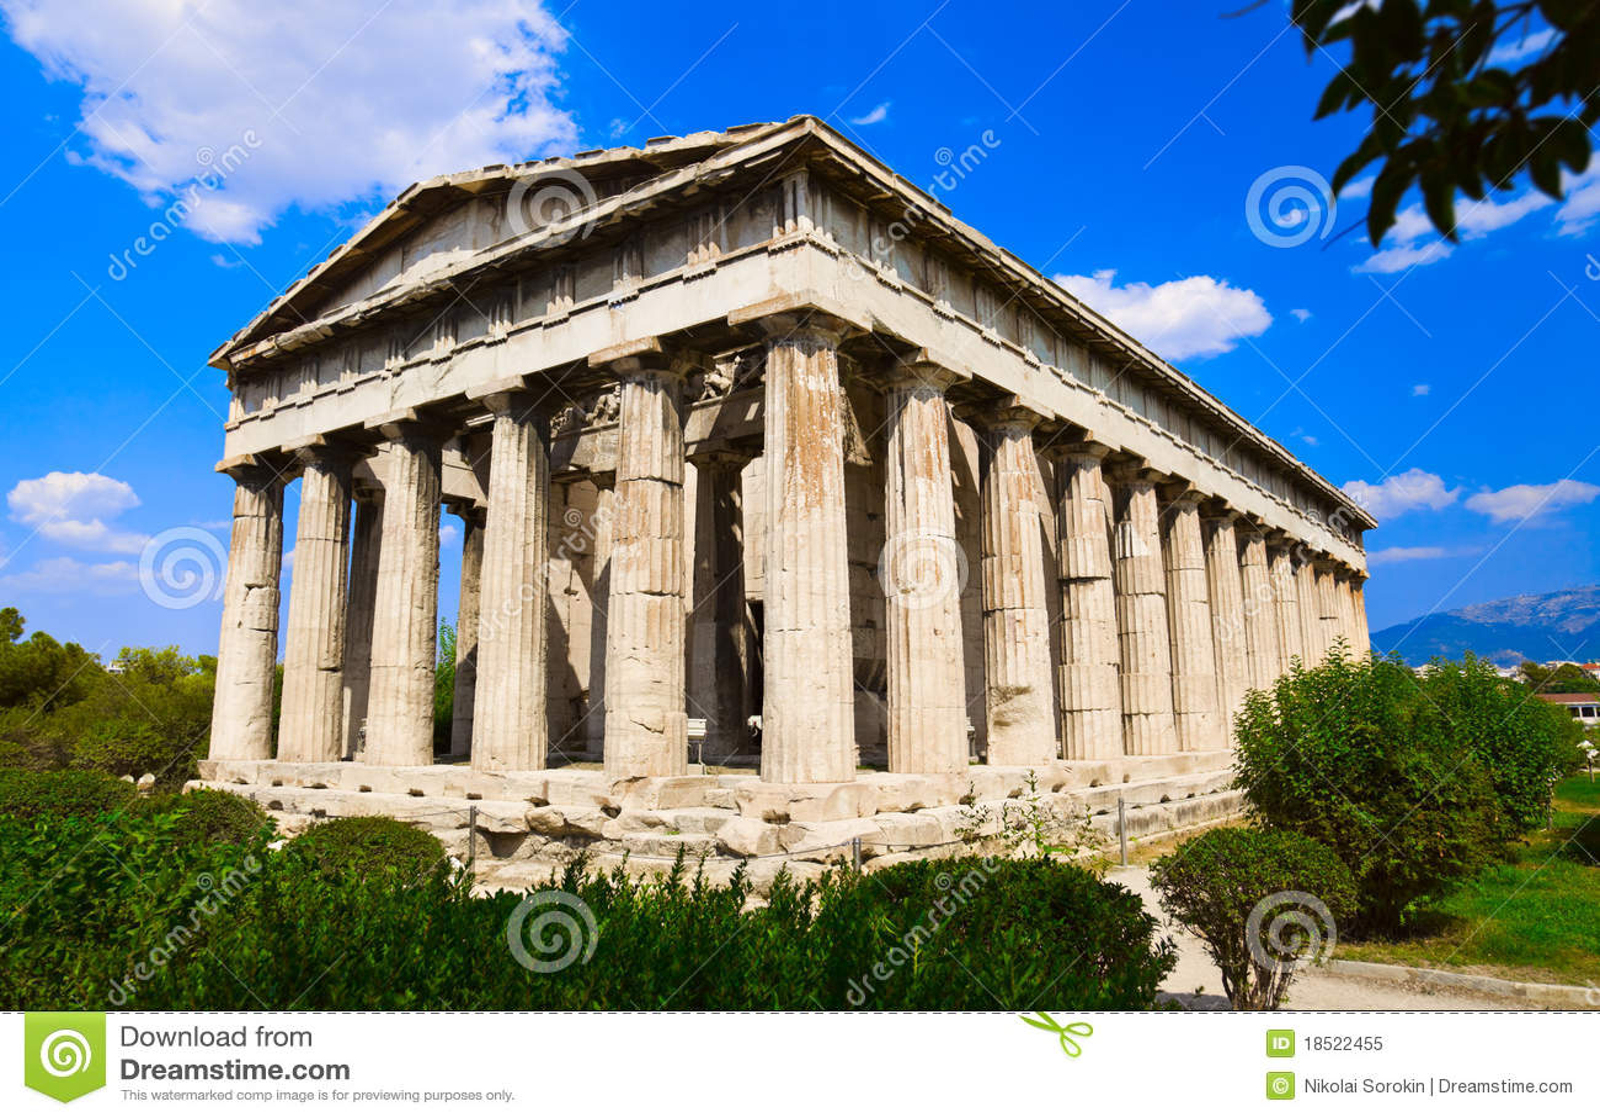 Ancient Agora At Athens, Greece Royalty Free Stock Photo - Image ...